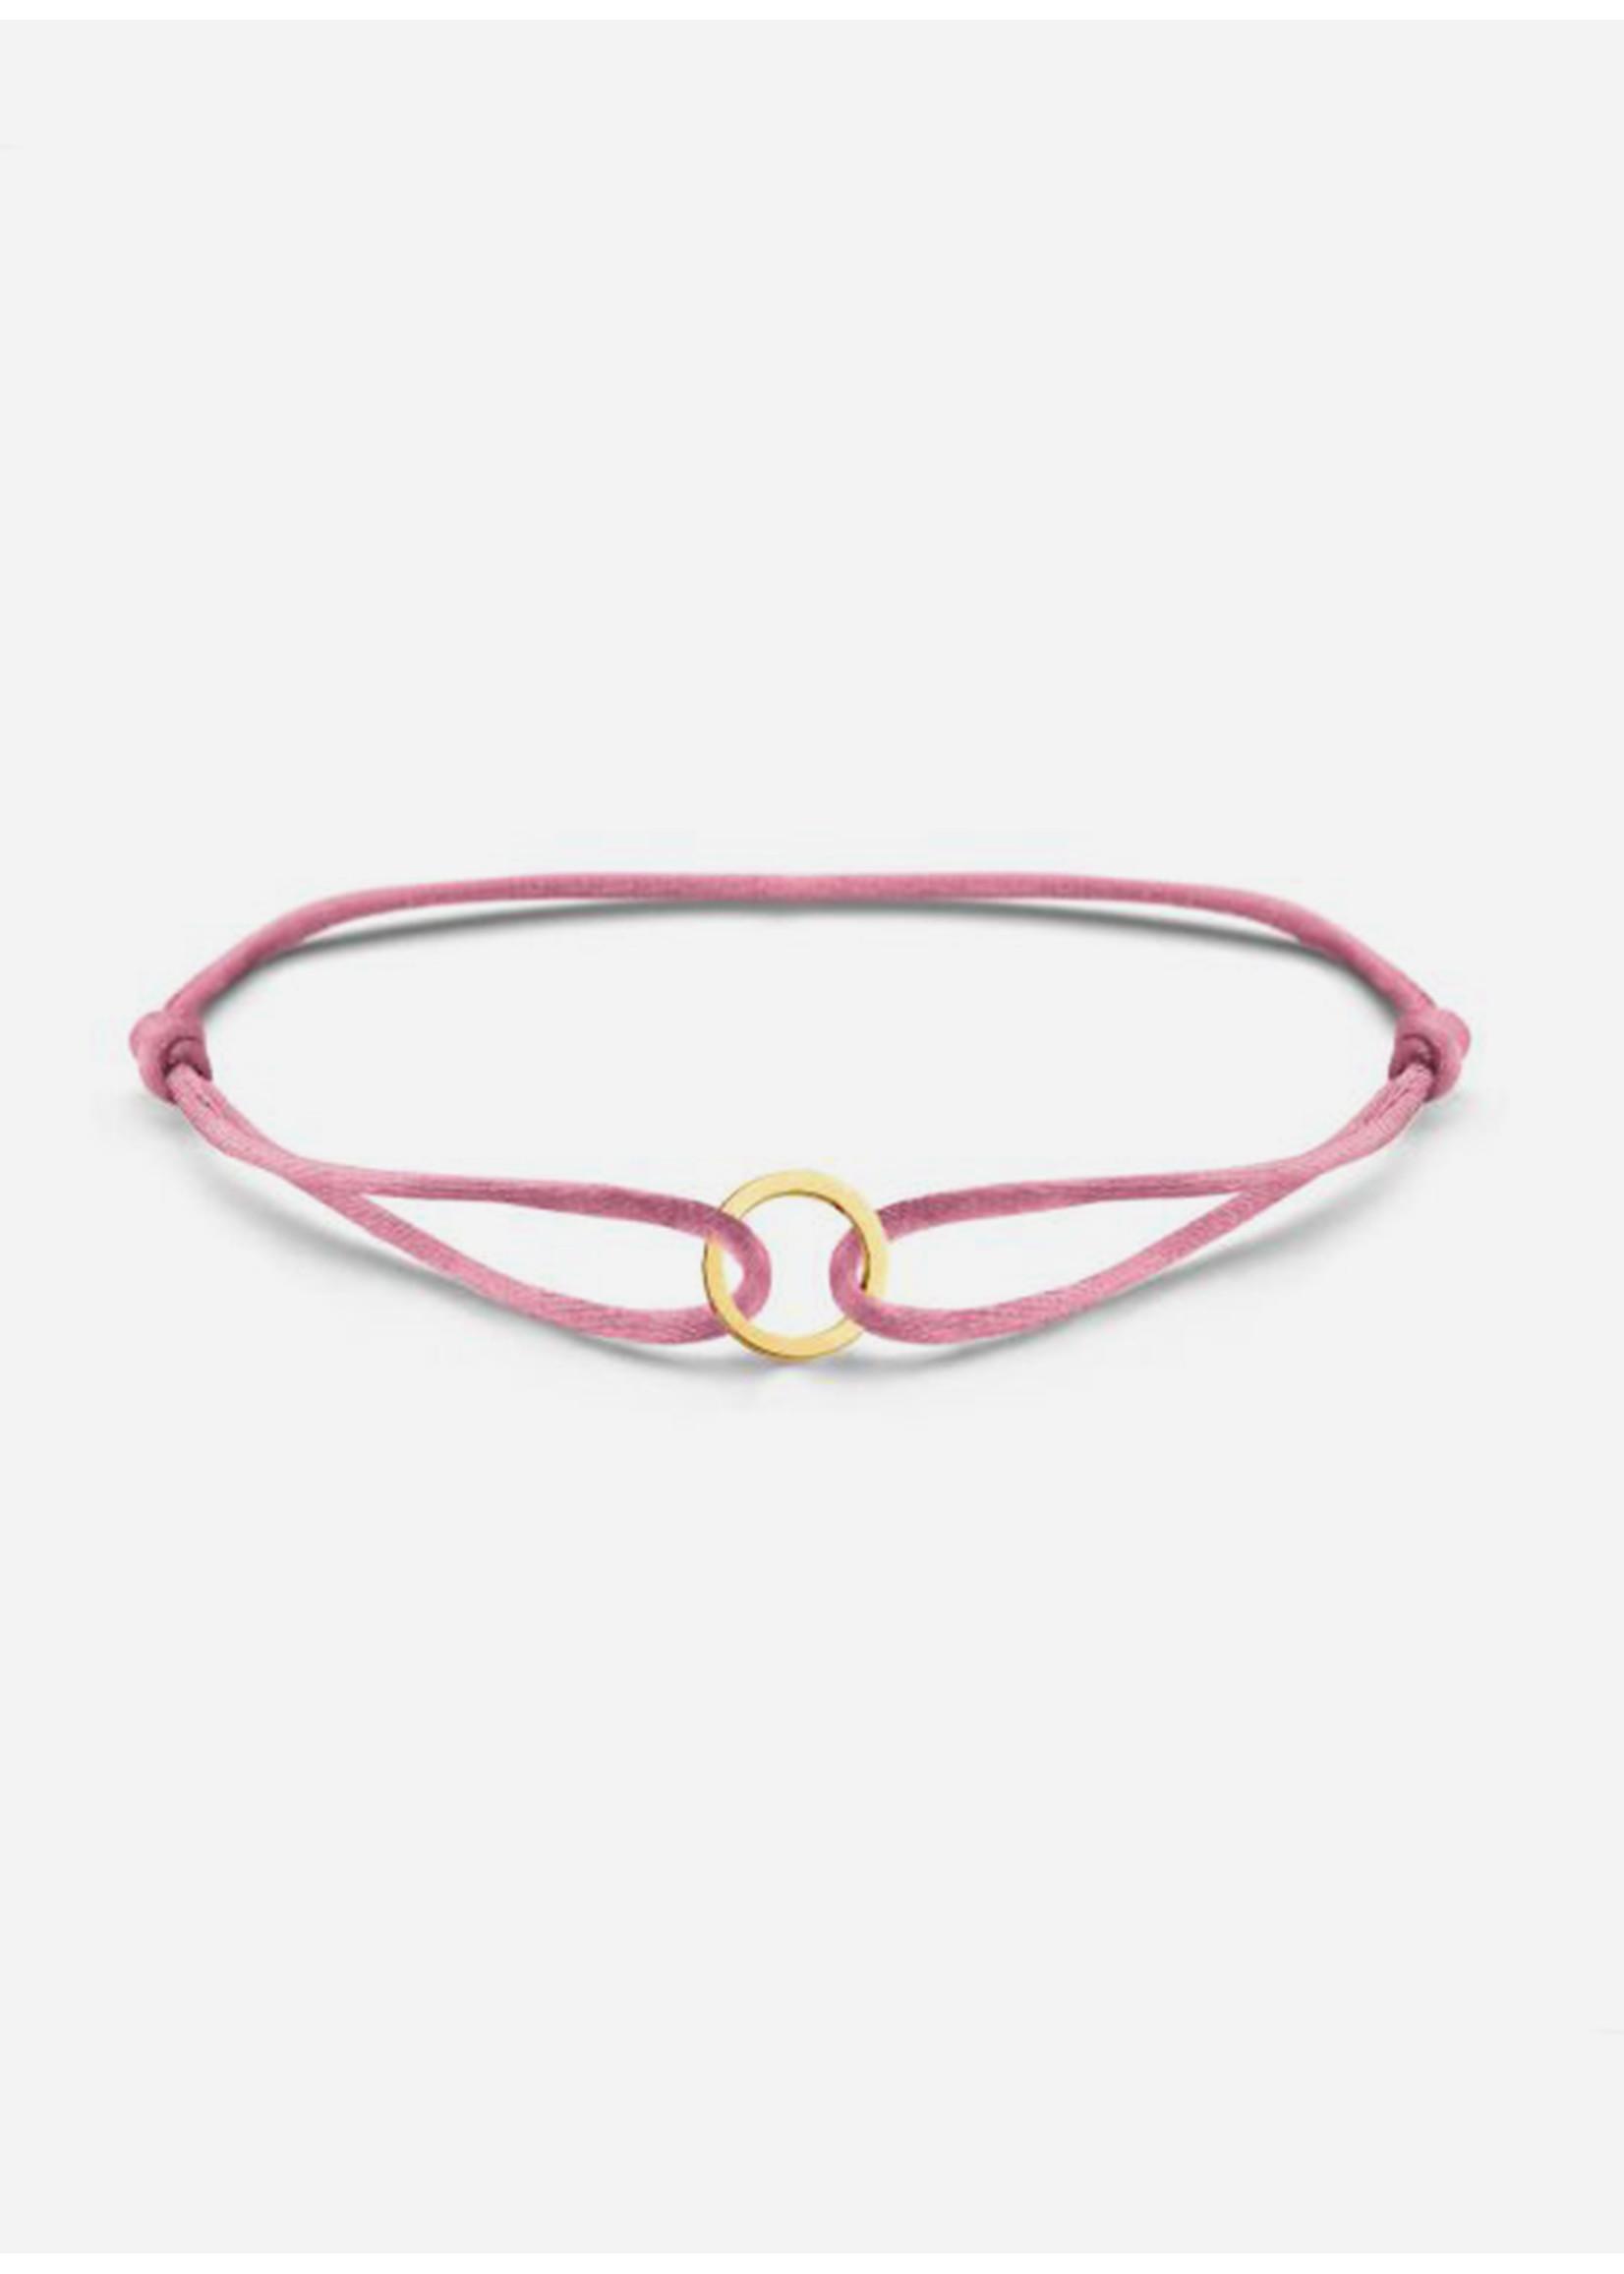 Just Franky Iconic bracelet round cord